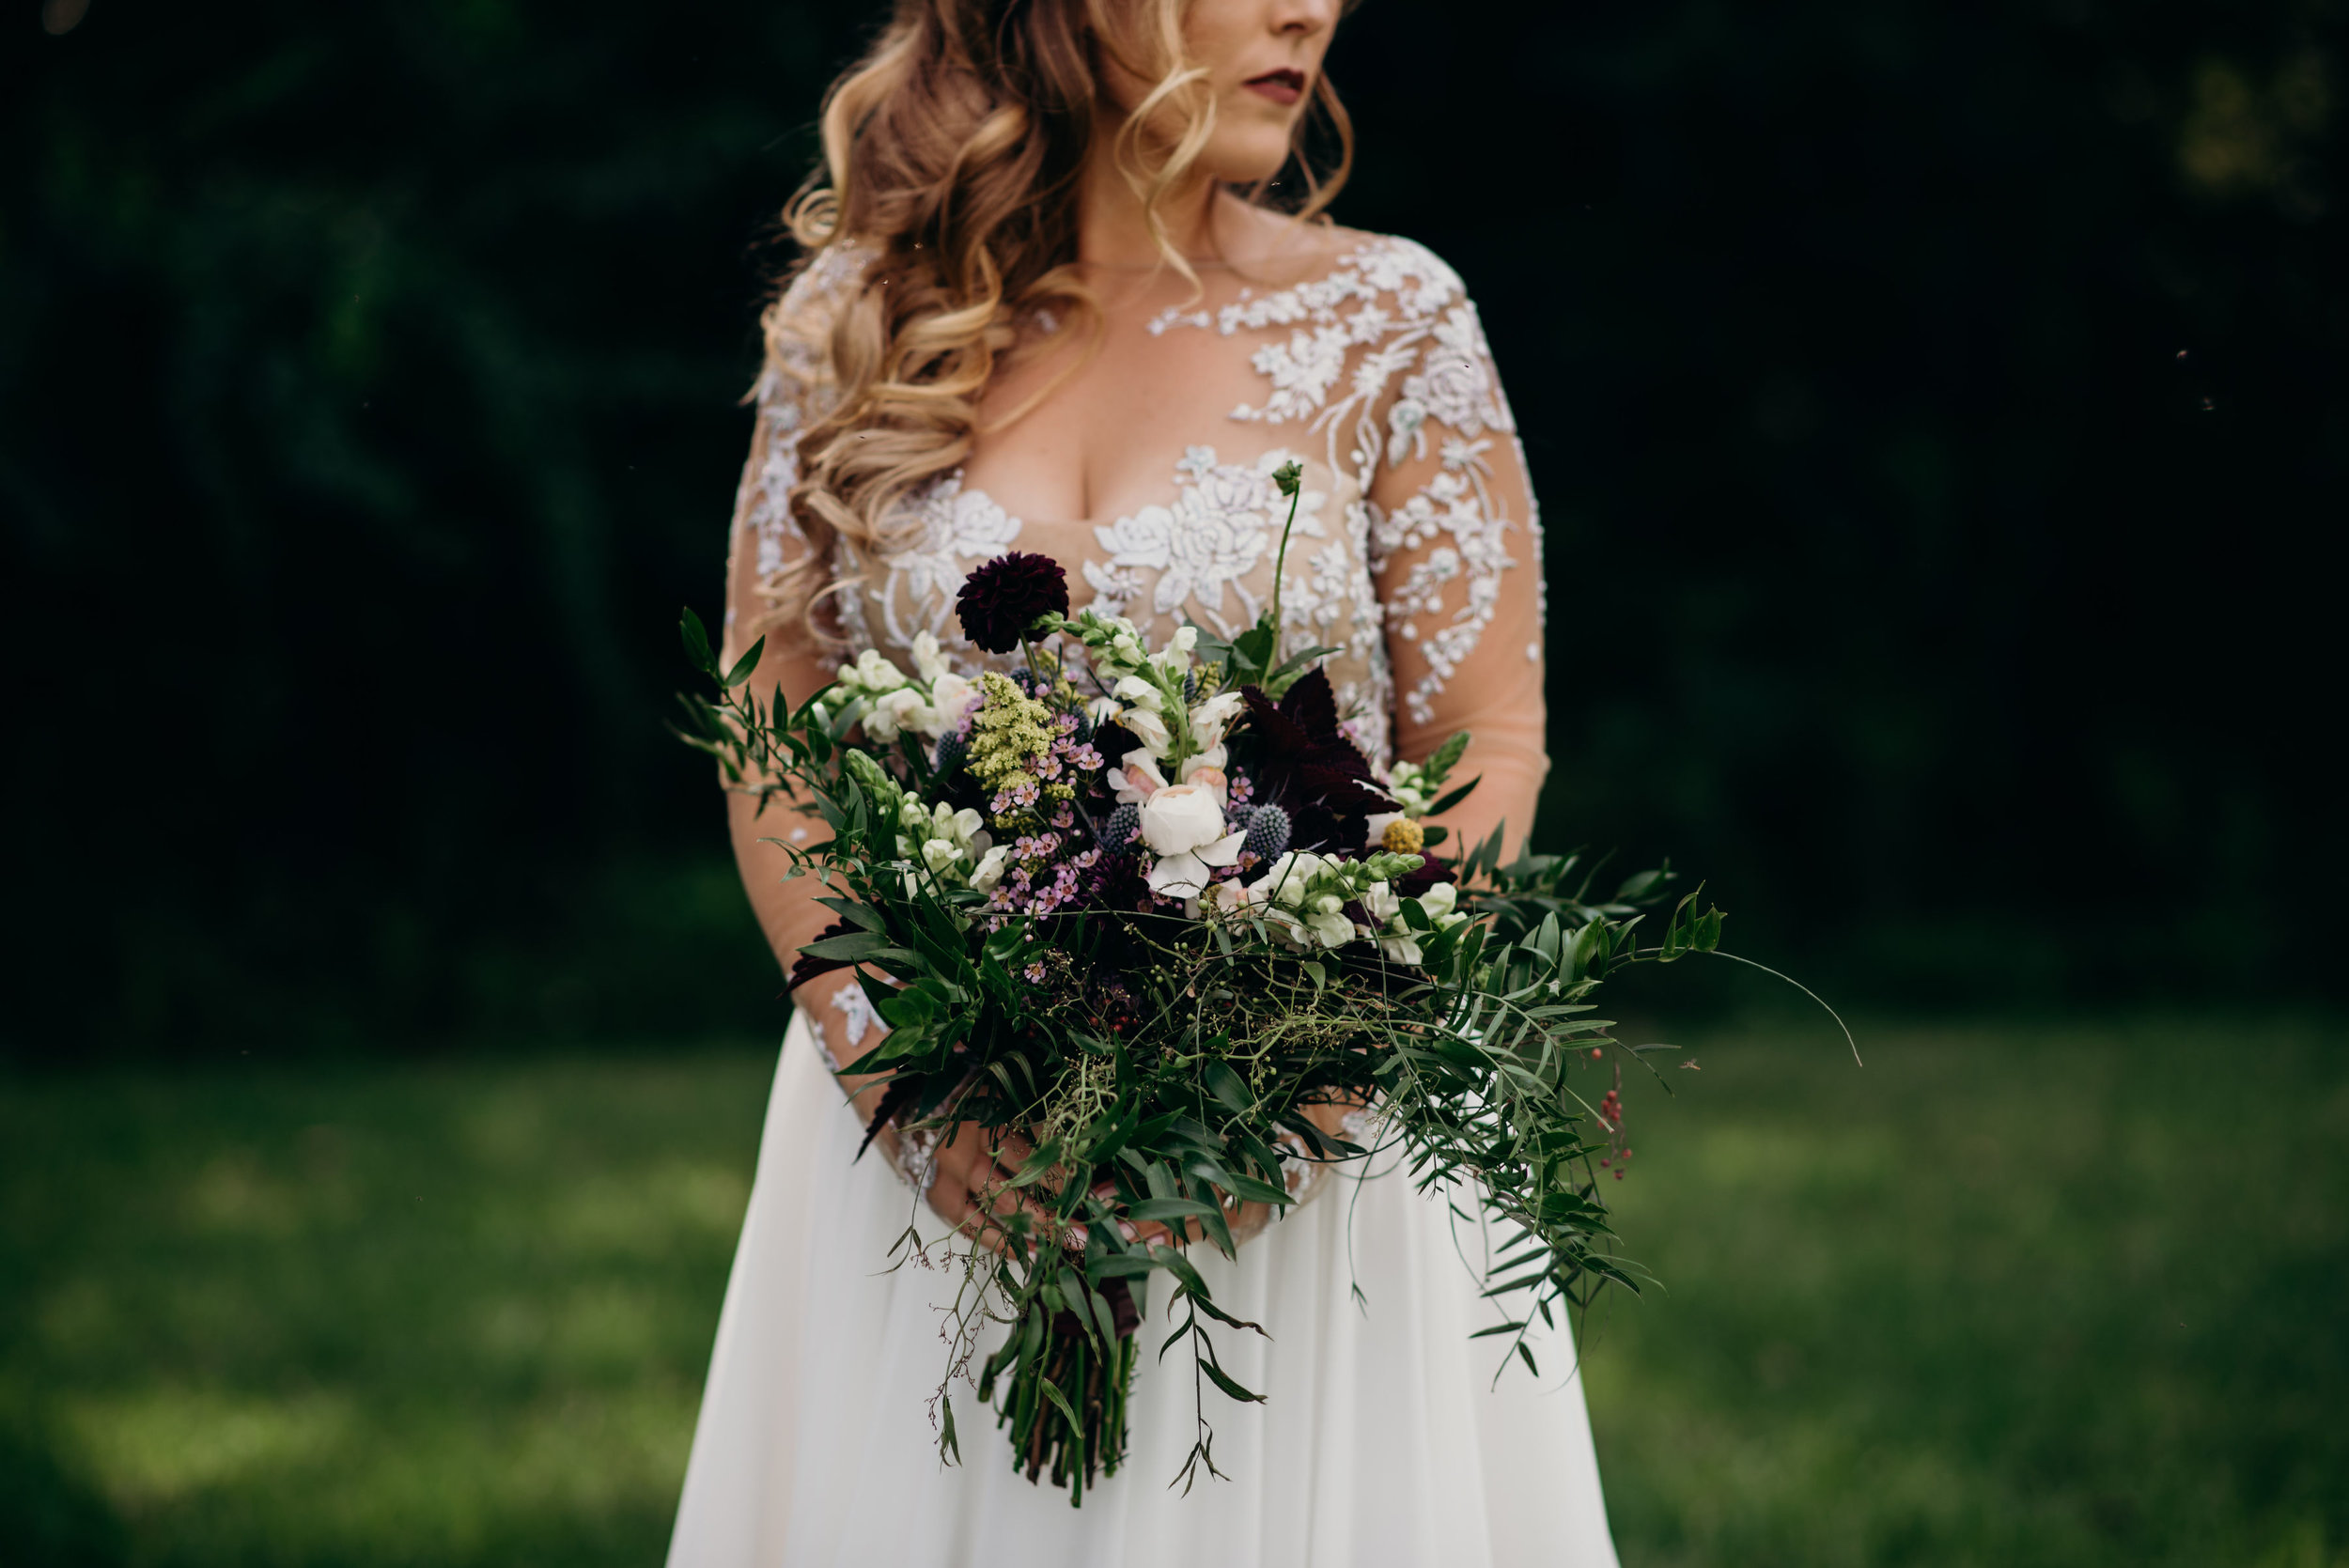 ryan-lauren-wedding-at-montfair-resort-farm-lindsey-paradiso-photography-7698.jpg